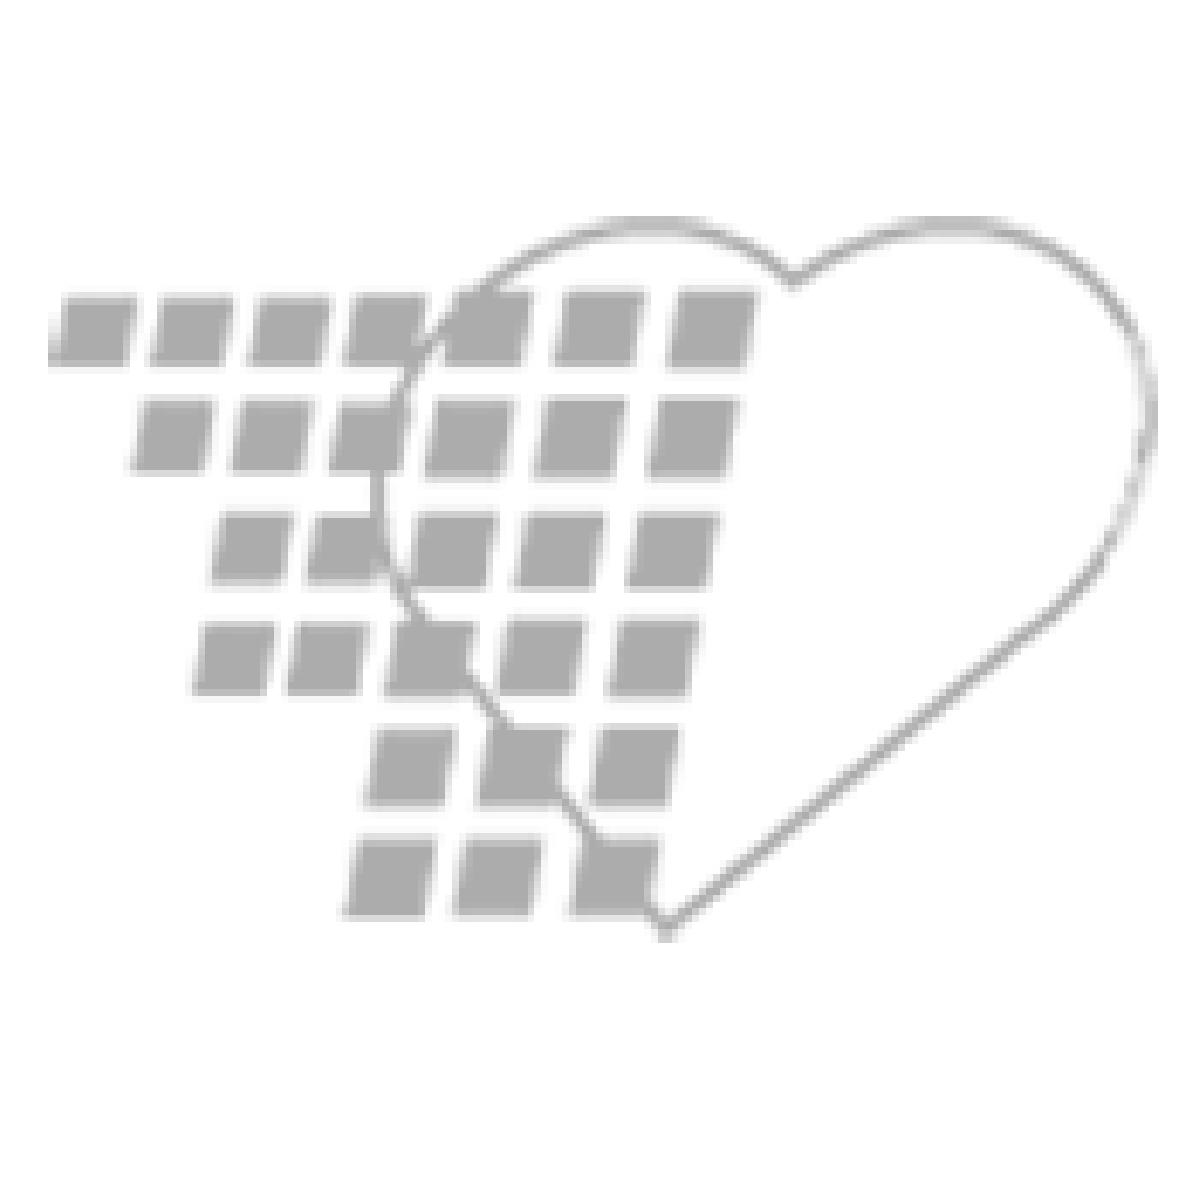 06-93-0330 - Demo Dose® Long Term Medication Card Bundle